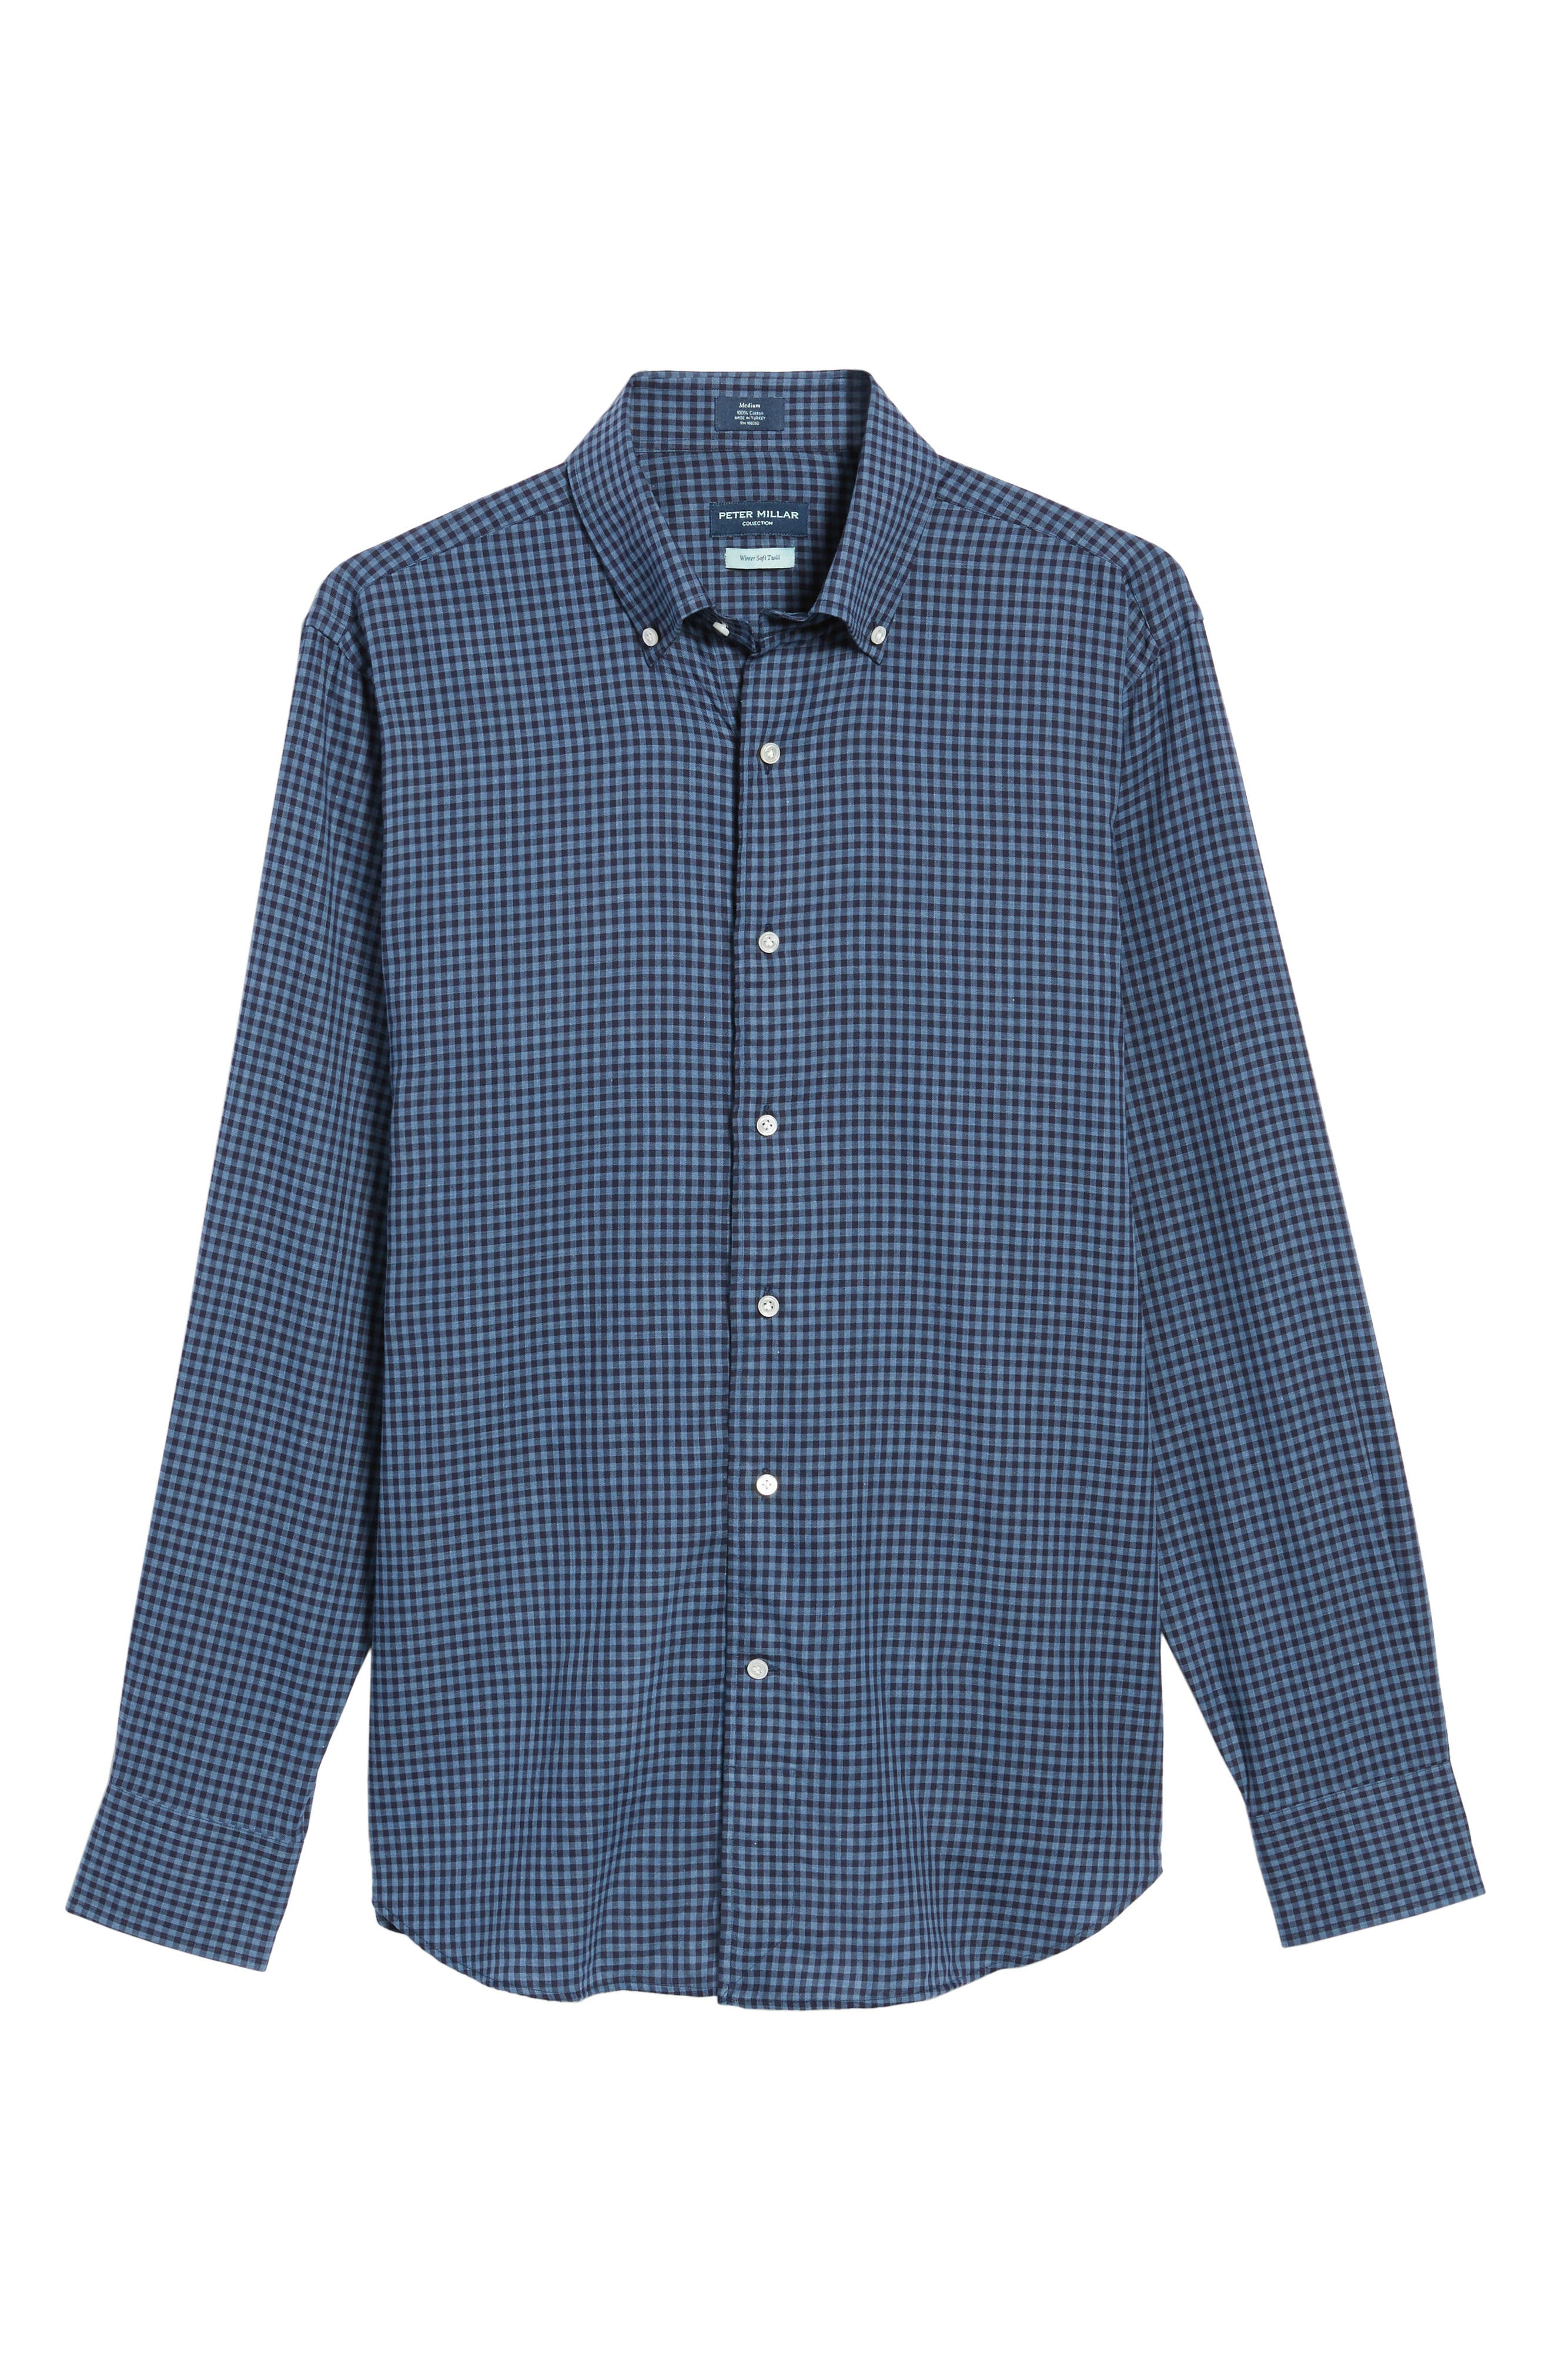 Peter Millar Caledonia Regular Fit Check Sport Shirt,                             Alternate thumbnail 6, color,                             Blue